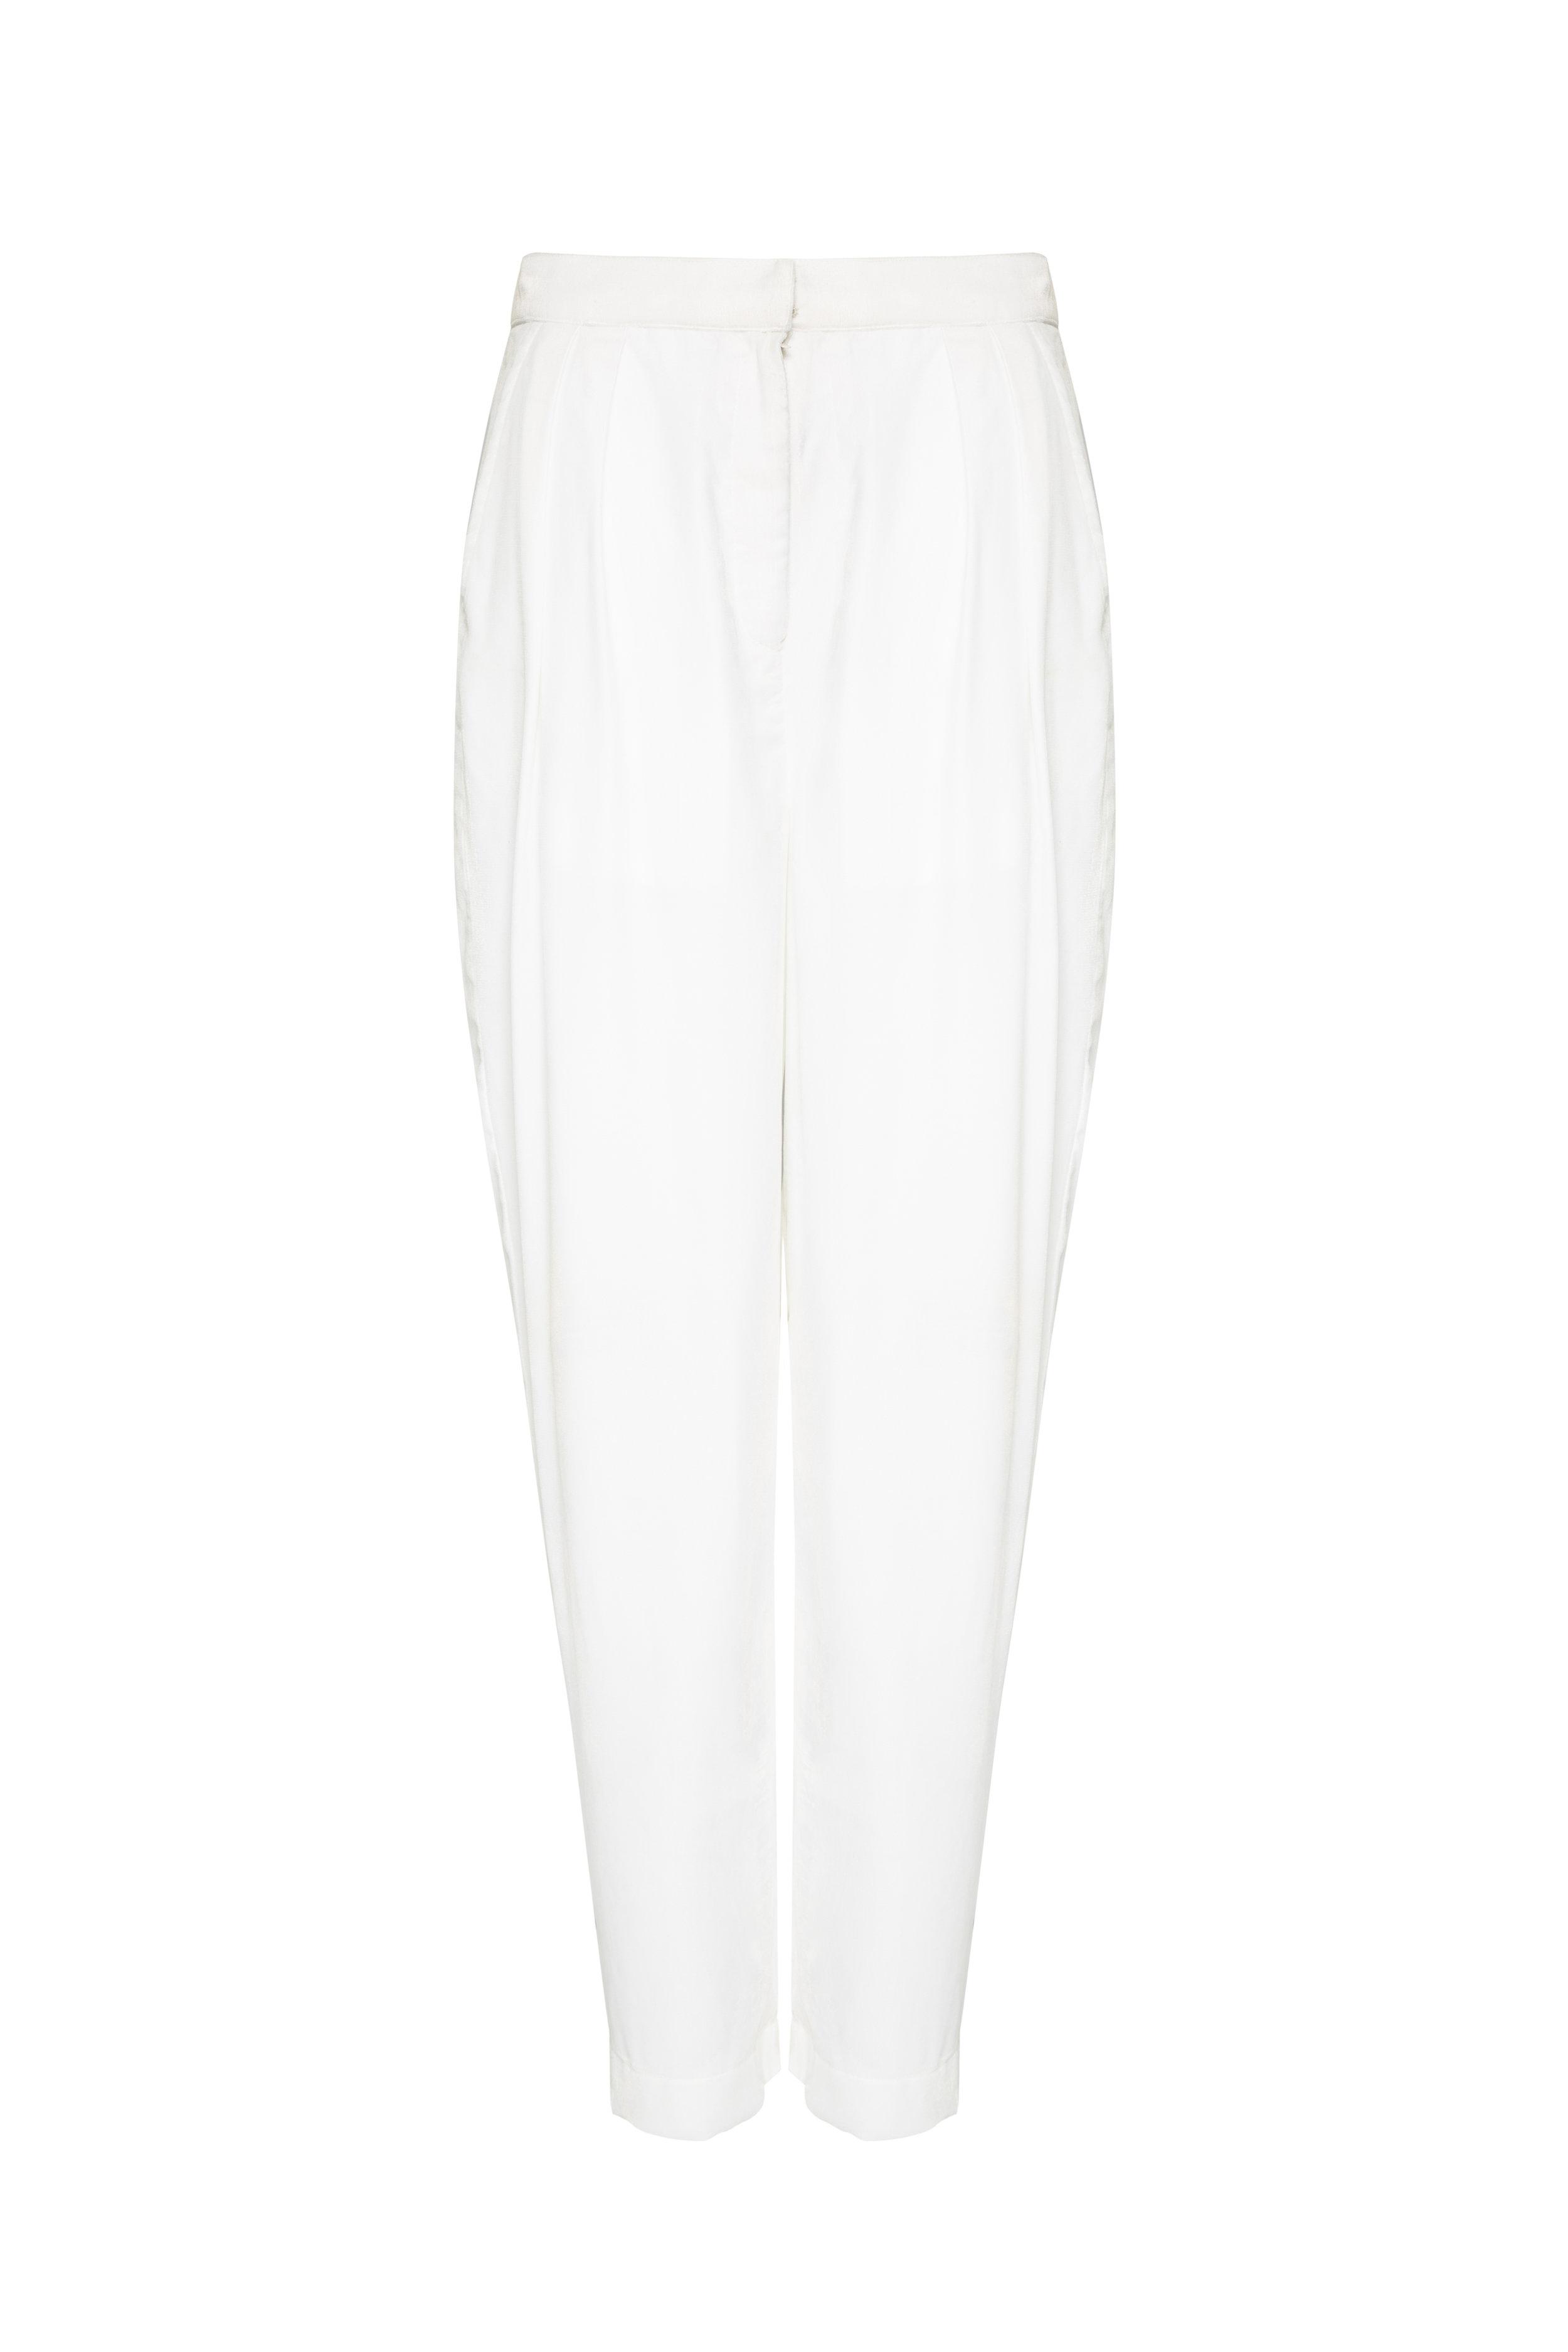 COMPLETE THE LOOK - Liya Pants 195 USD